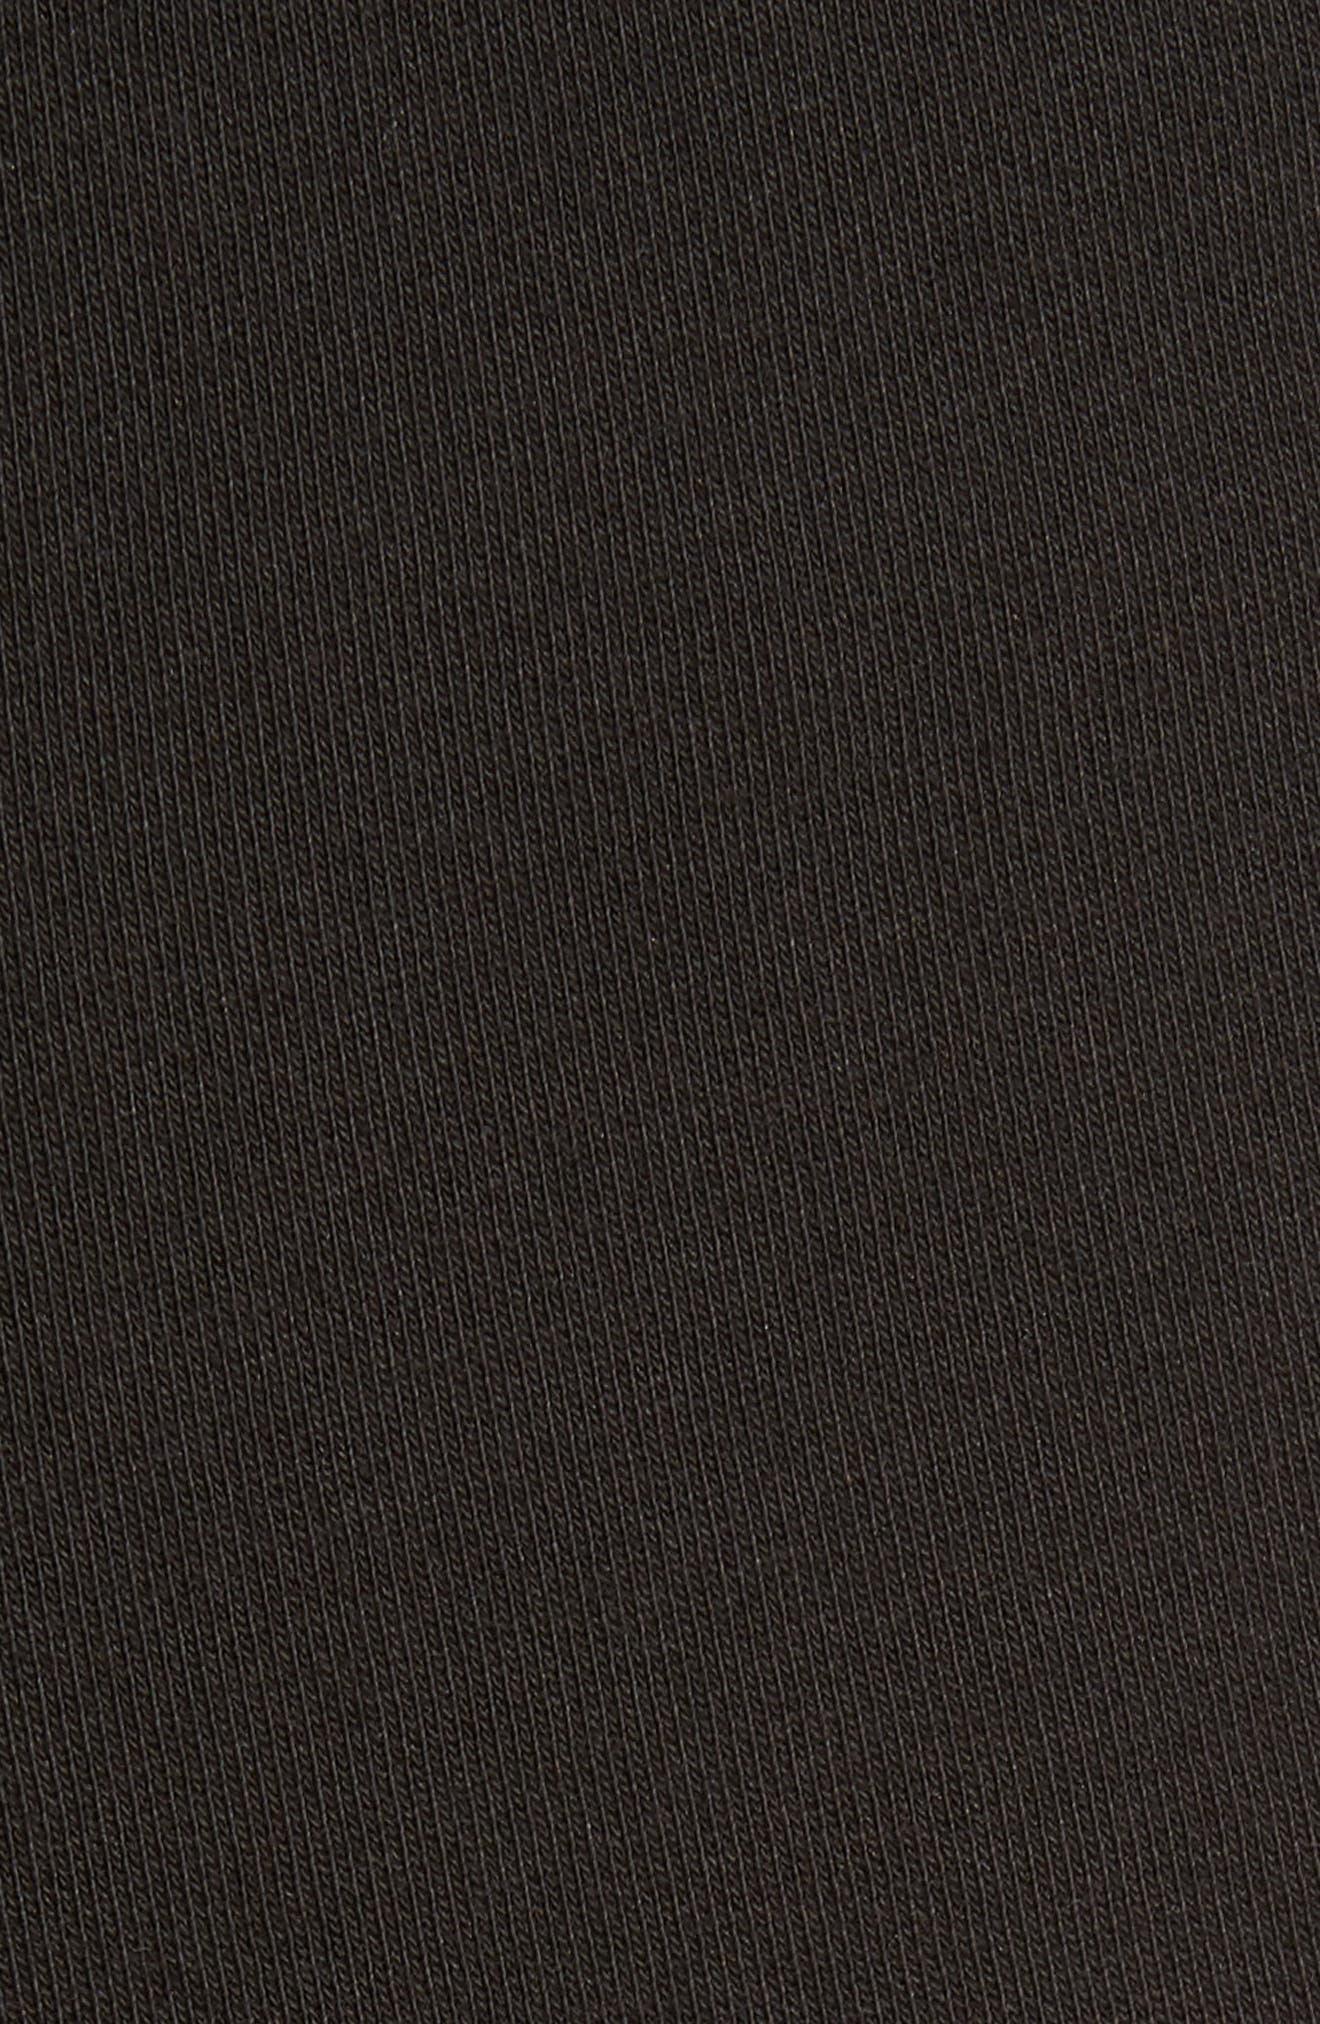 Modern Cotton Blend Lounge Pants,                             Alternate thumbnail 5, color,                             002